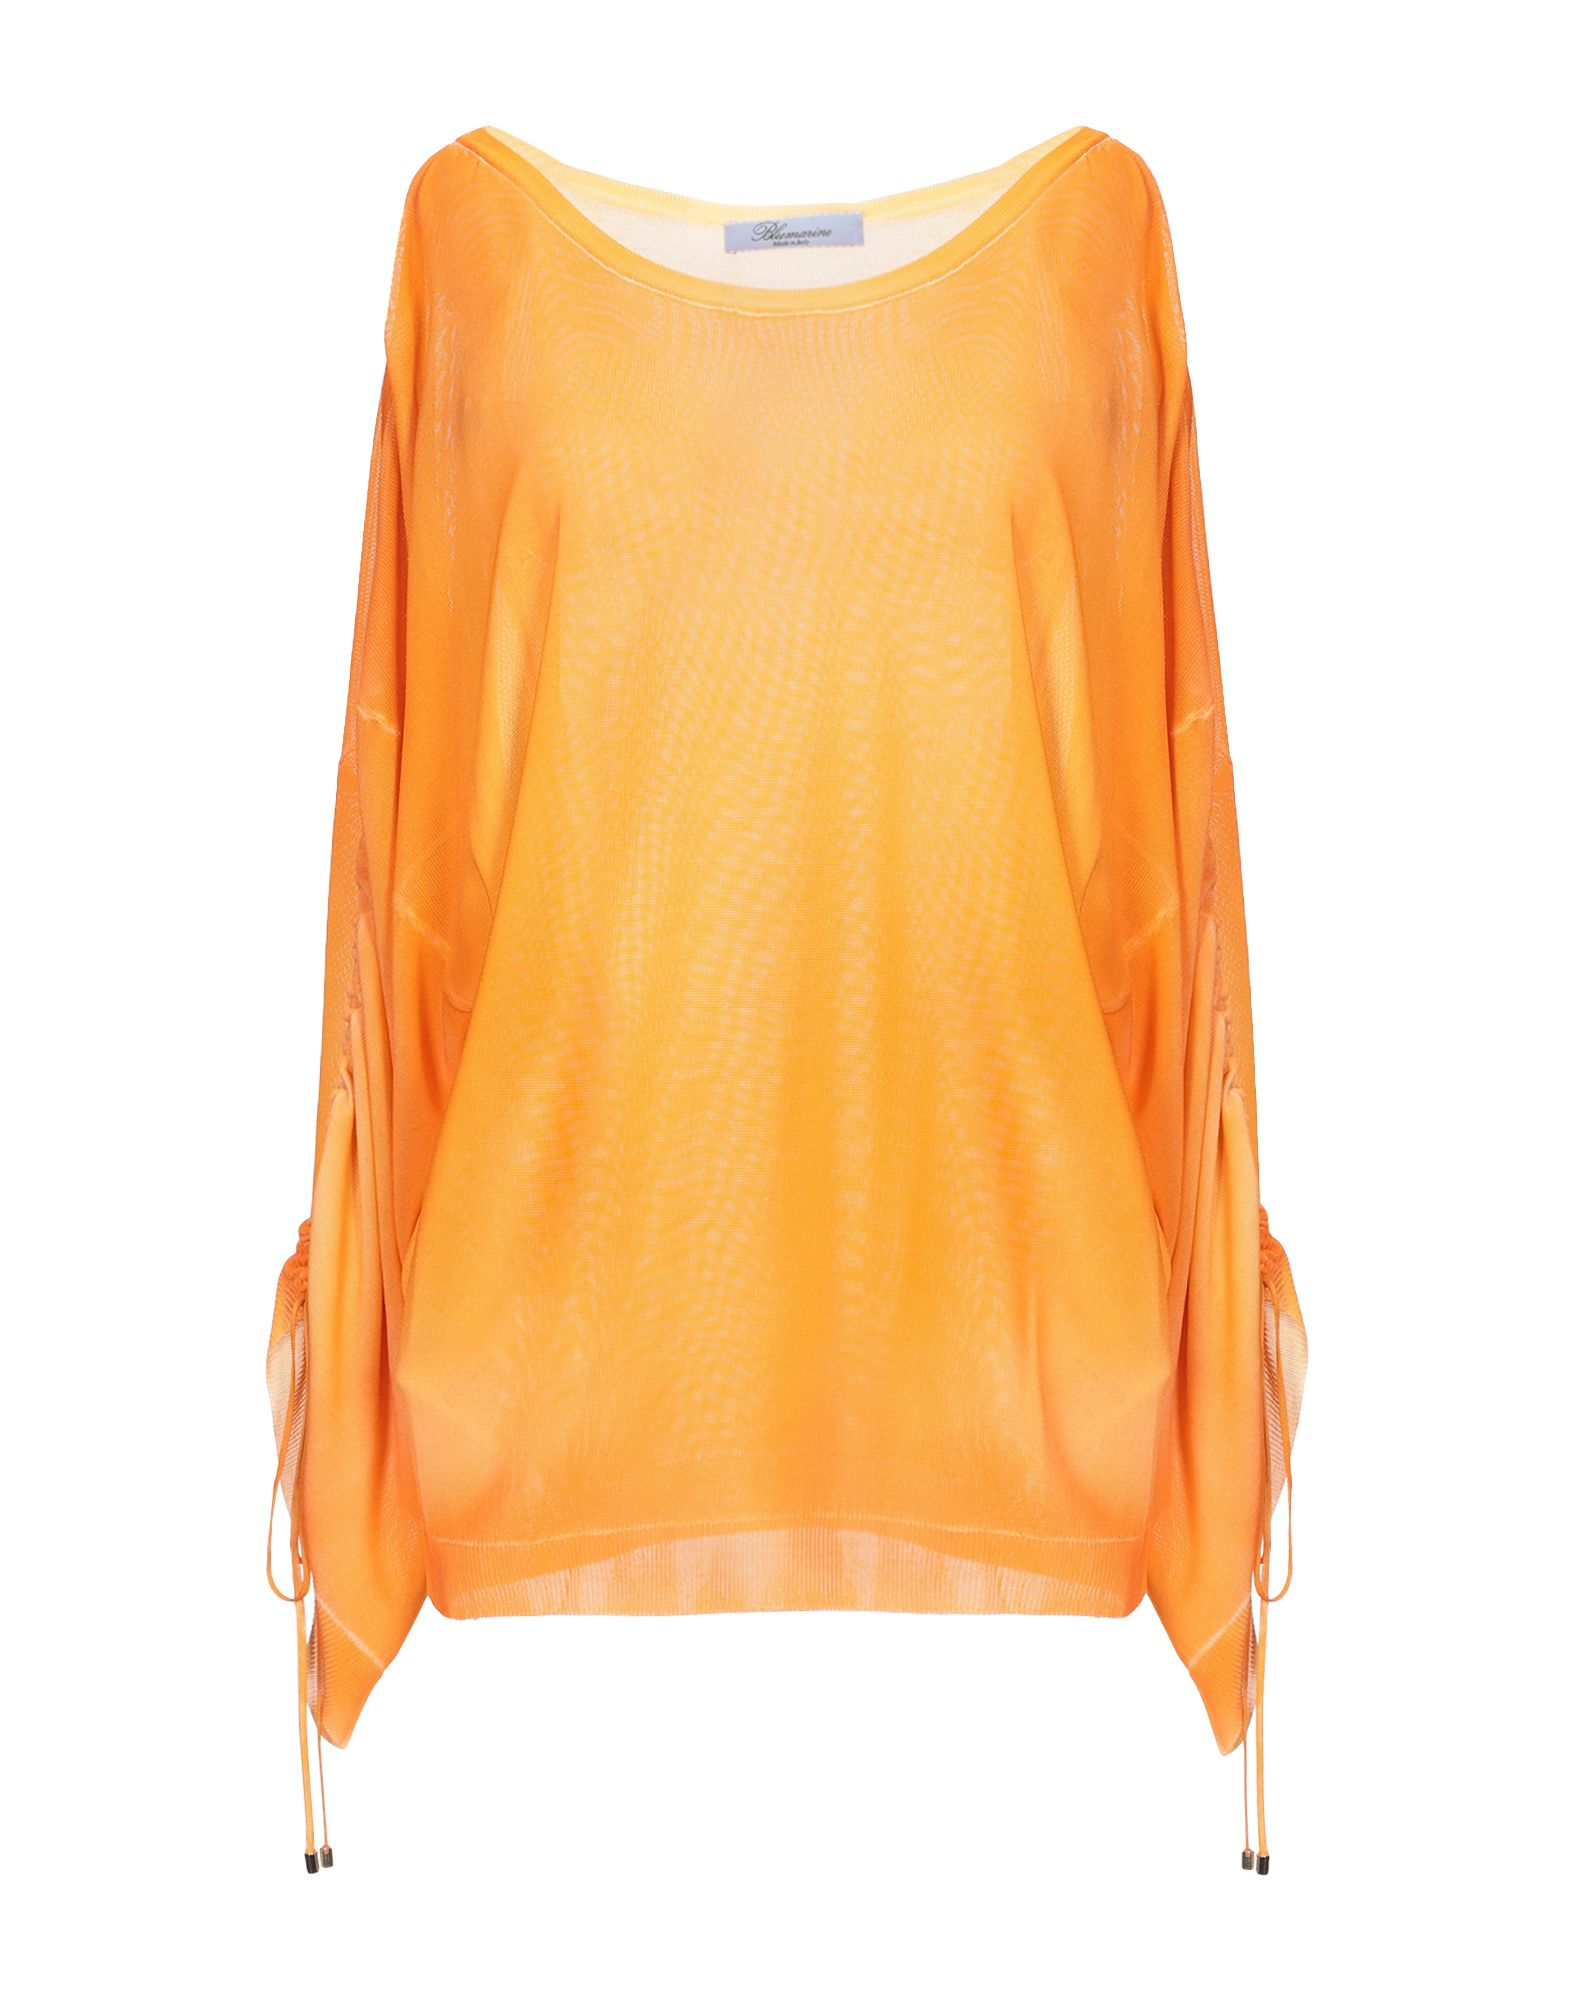 BLUMARINE Sweaters - Item 14009631